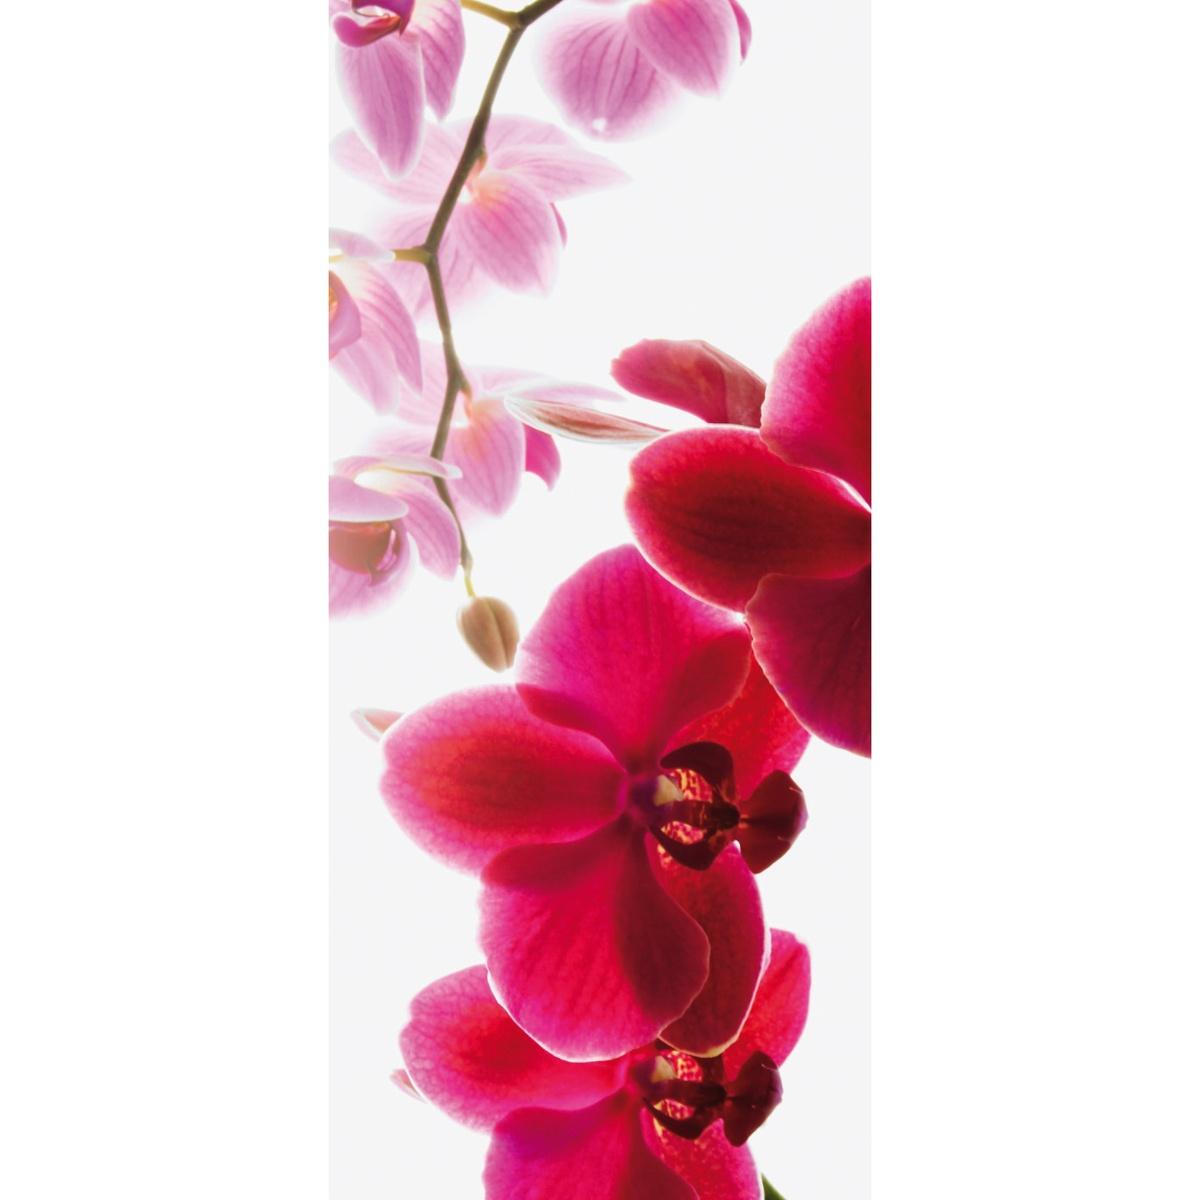 Fototapeta orchidea 95 x 210 cm, Wall